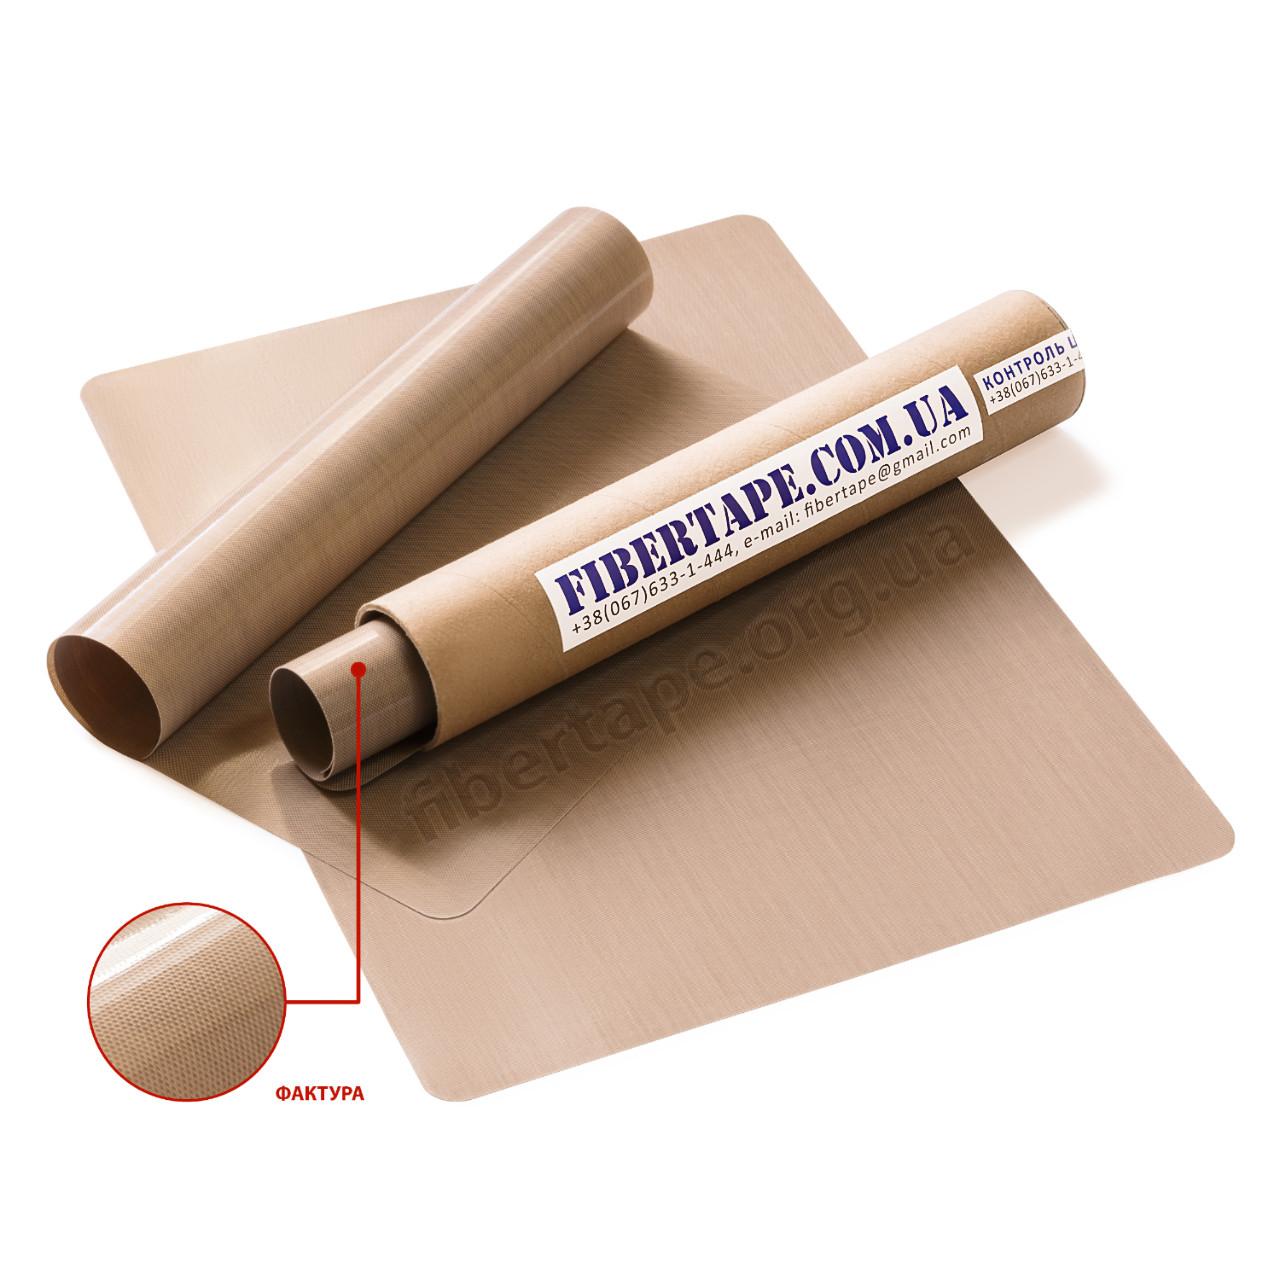 Тефлоновый коврик для выпечки 125 мкм, 400х600 мм